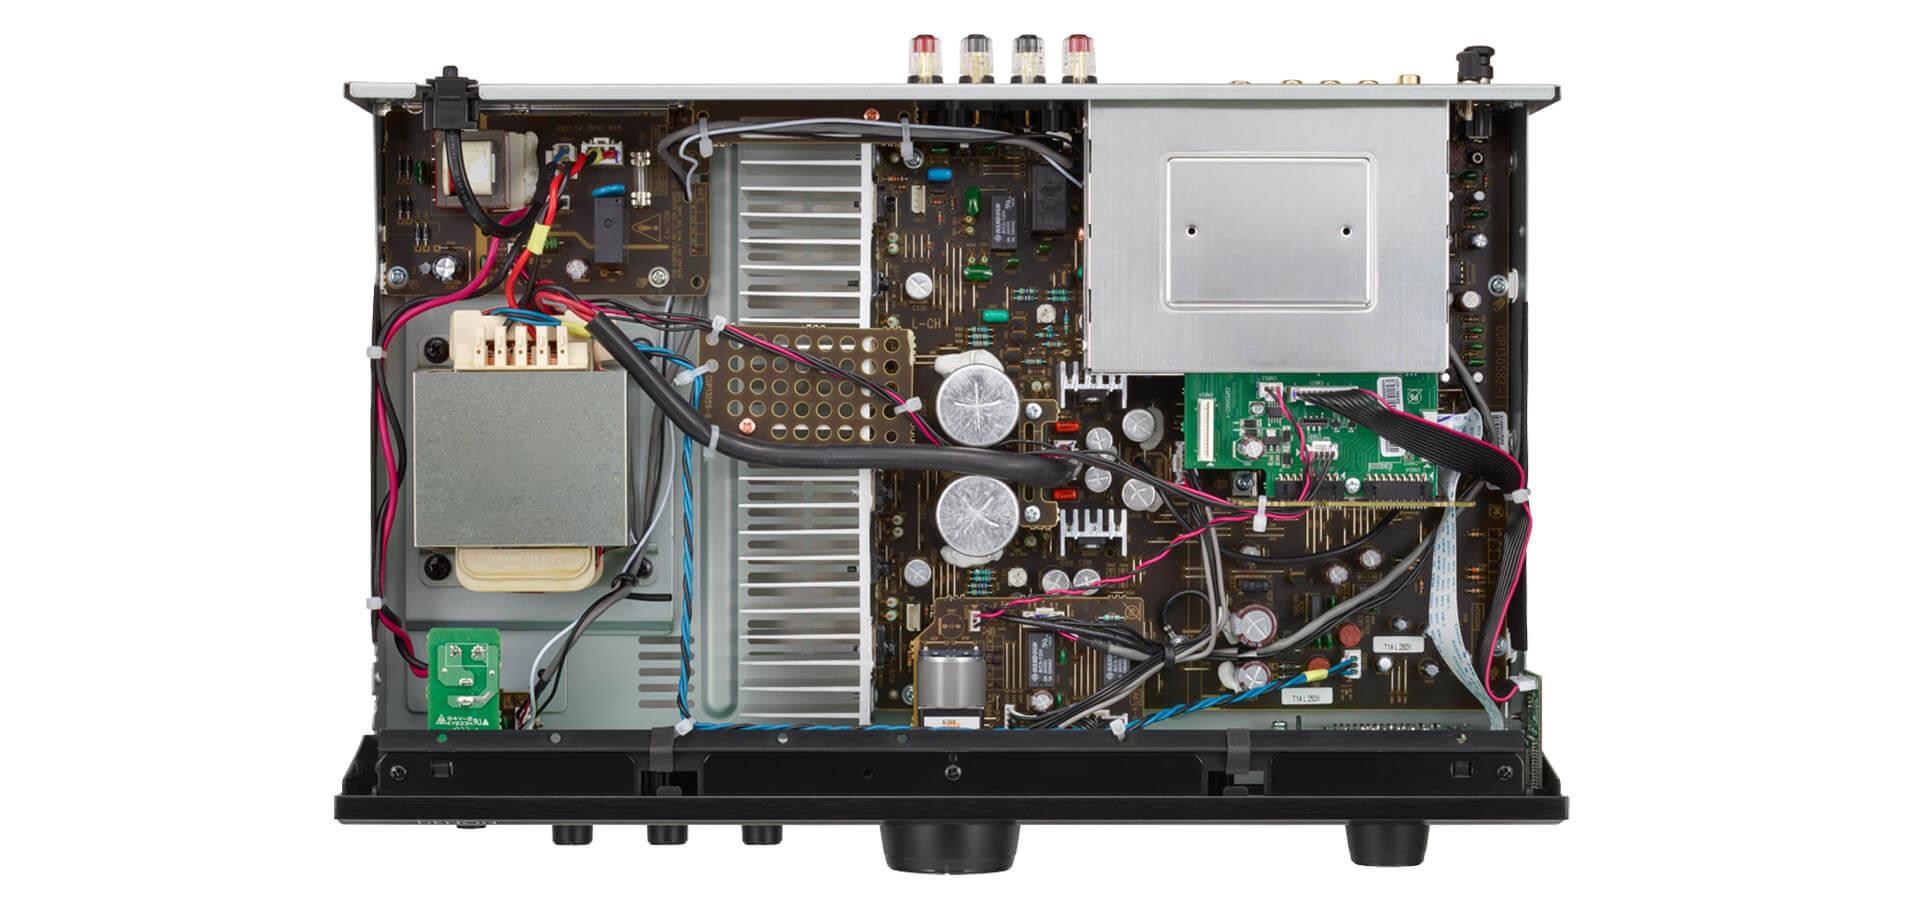 Ampli Denon PMA-600NE | Anh Duy Audio